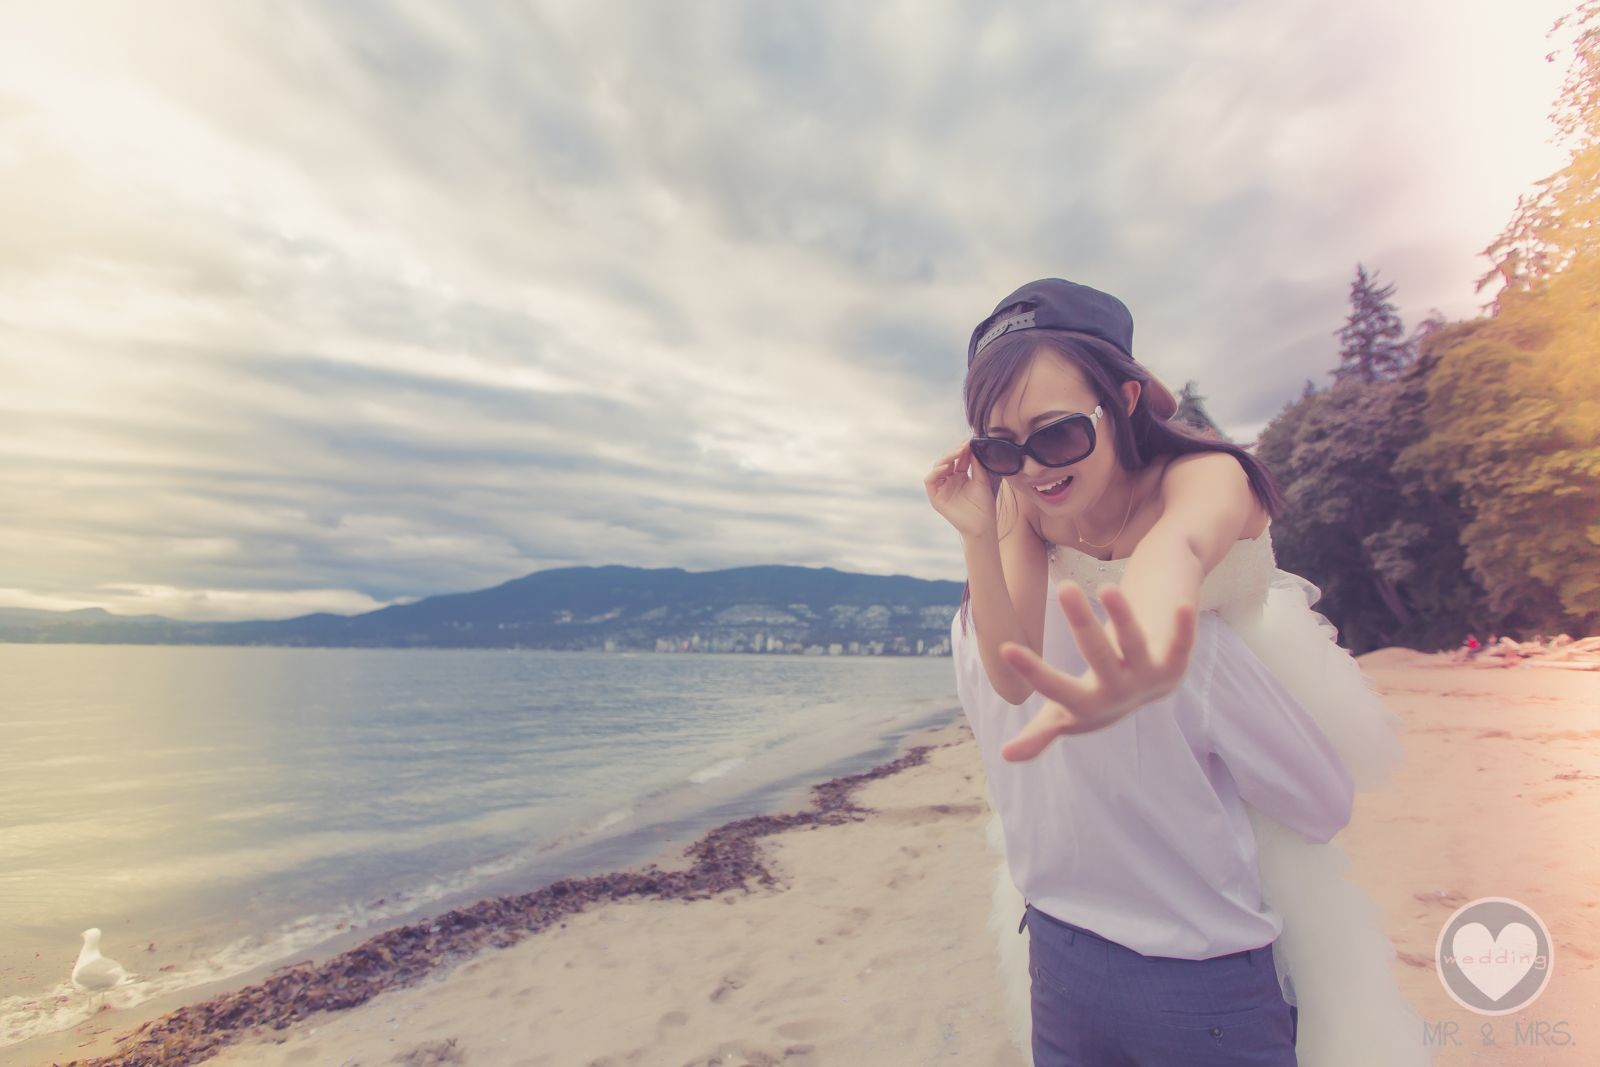 Pre wedding beach  Pin by MrMrs Wedding on Prewedding Lets go to the beach  Pinterest